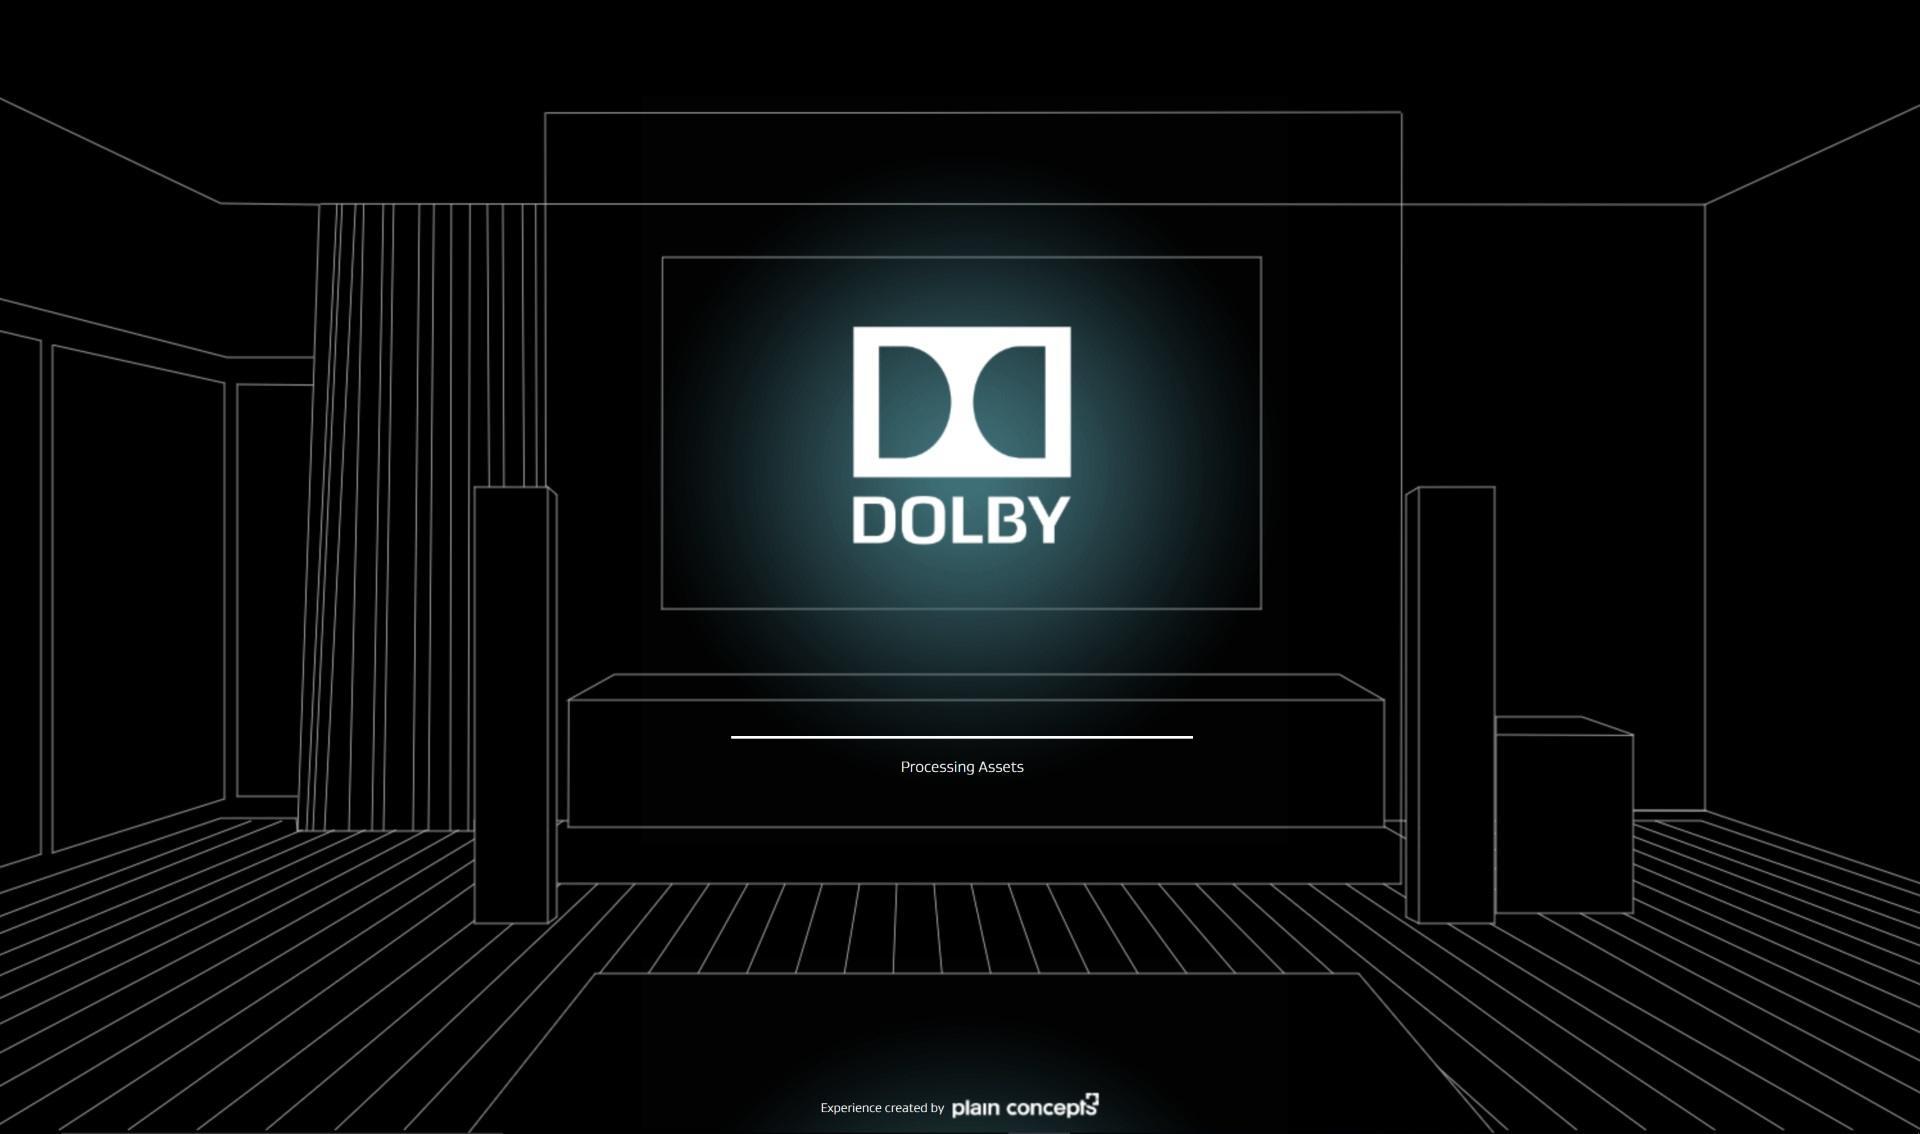 دالبی و توسعه اسپیکر لپتاپ ها